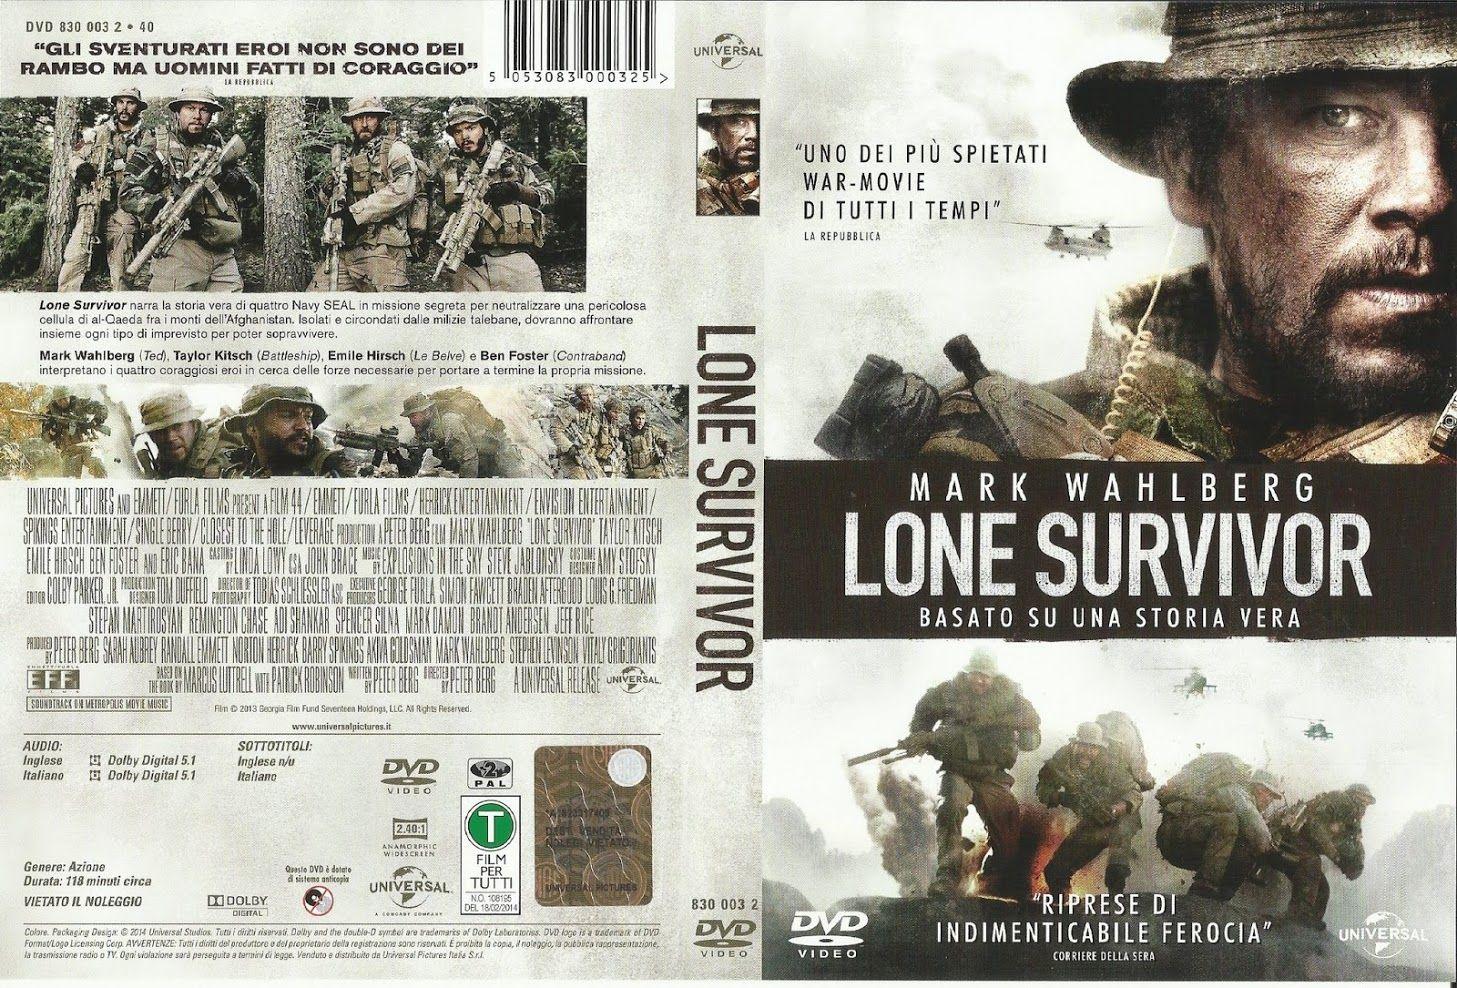 Foto in DVD Covers - Foto Google